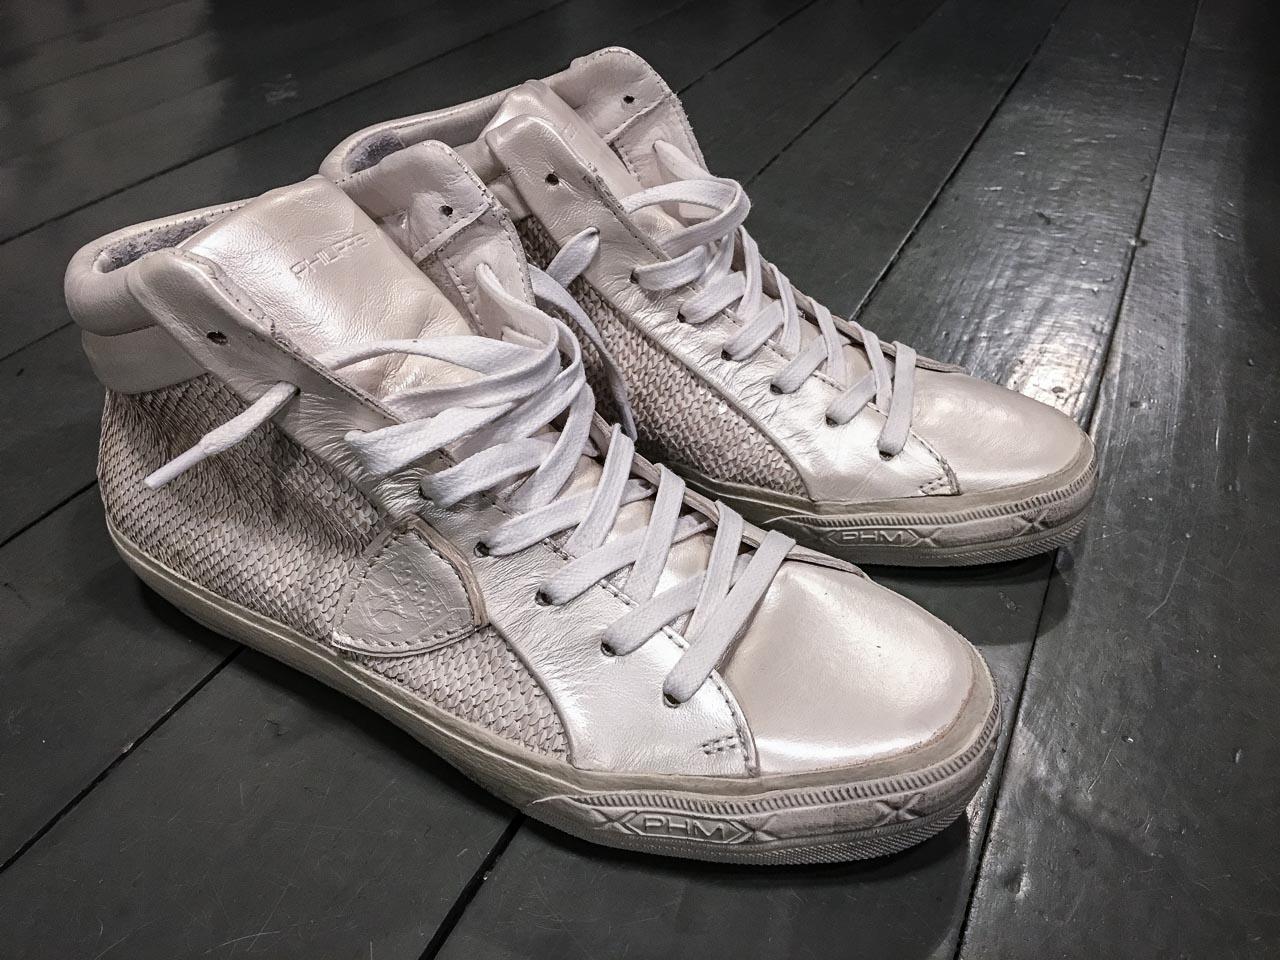 Pailetten Sneaker von Philippe Model